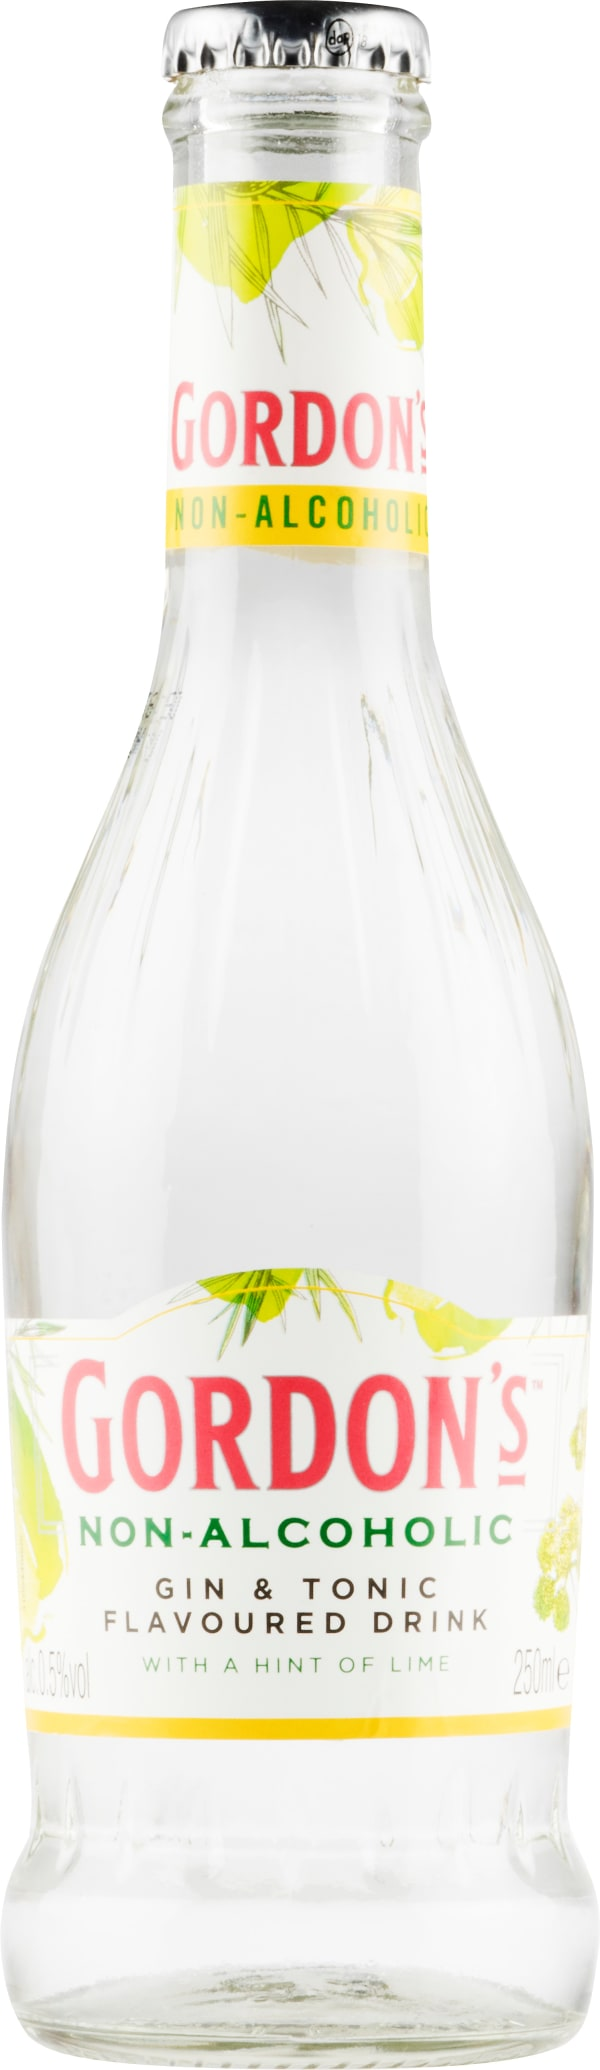 Gordon's Non-Alcoholic Gin & Tonic